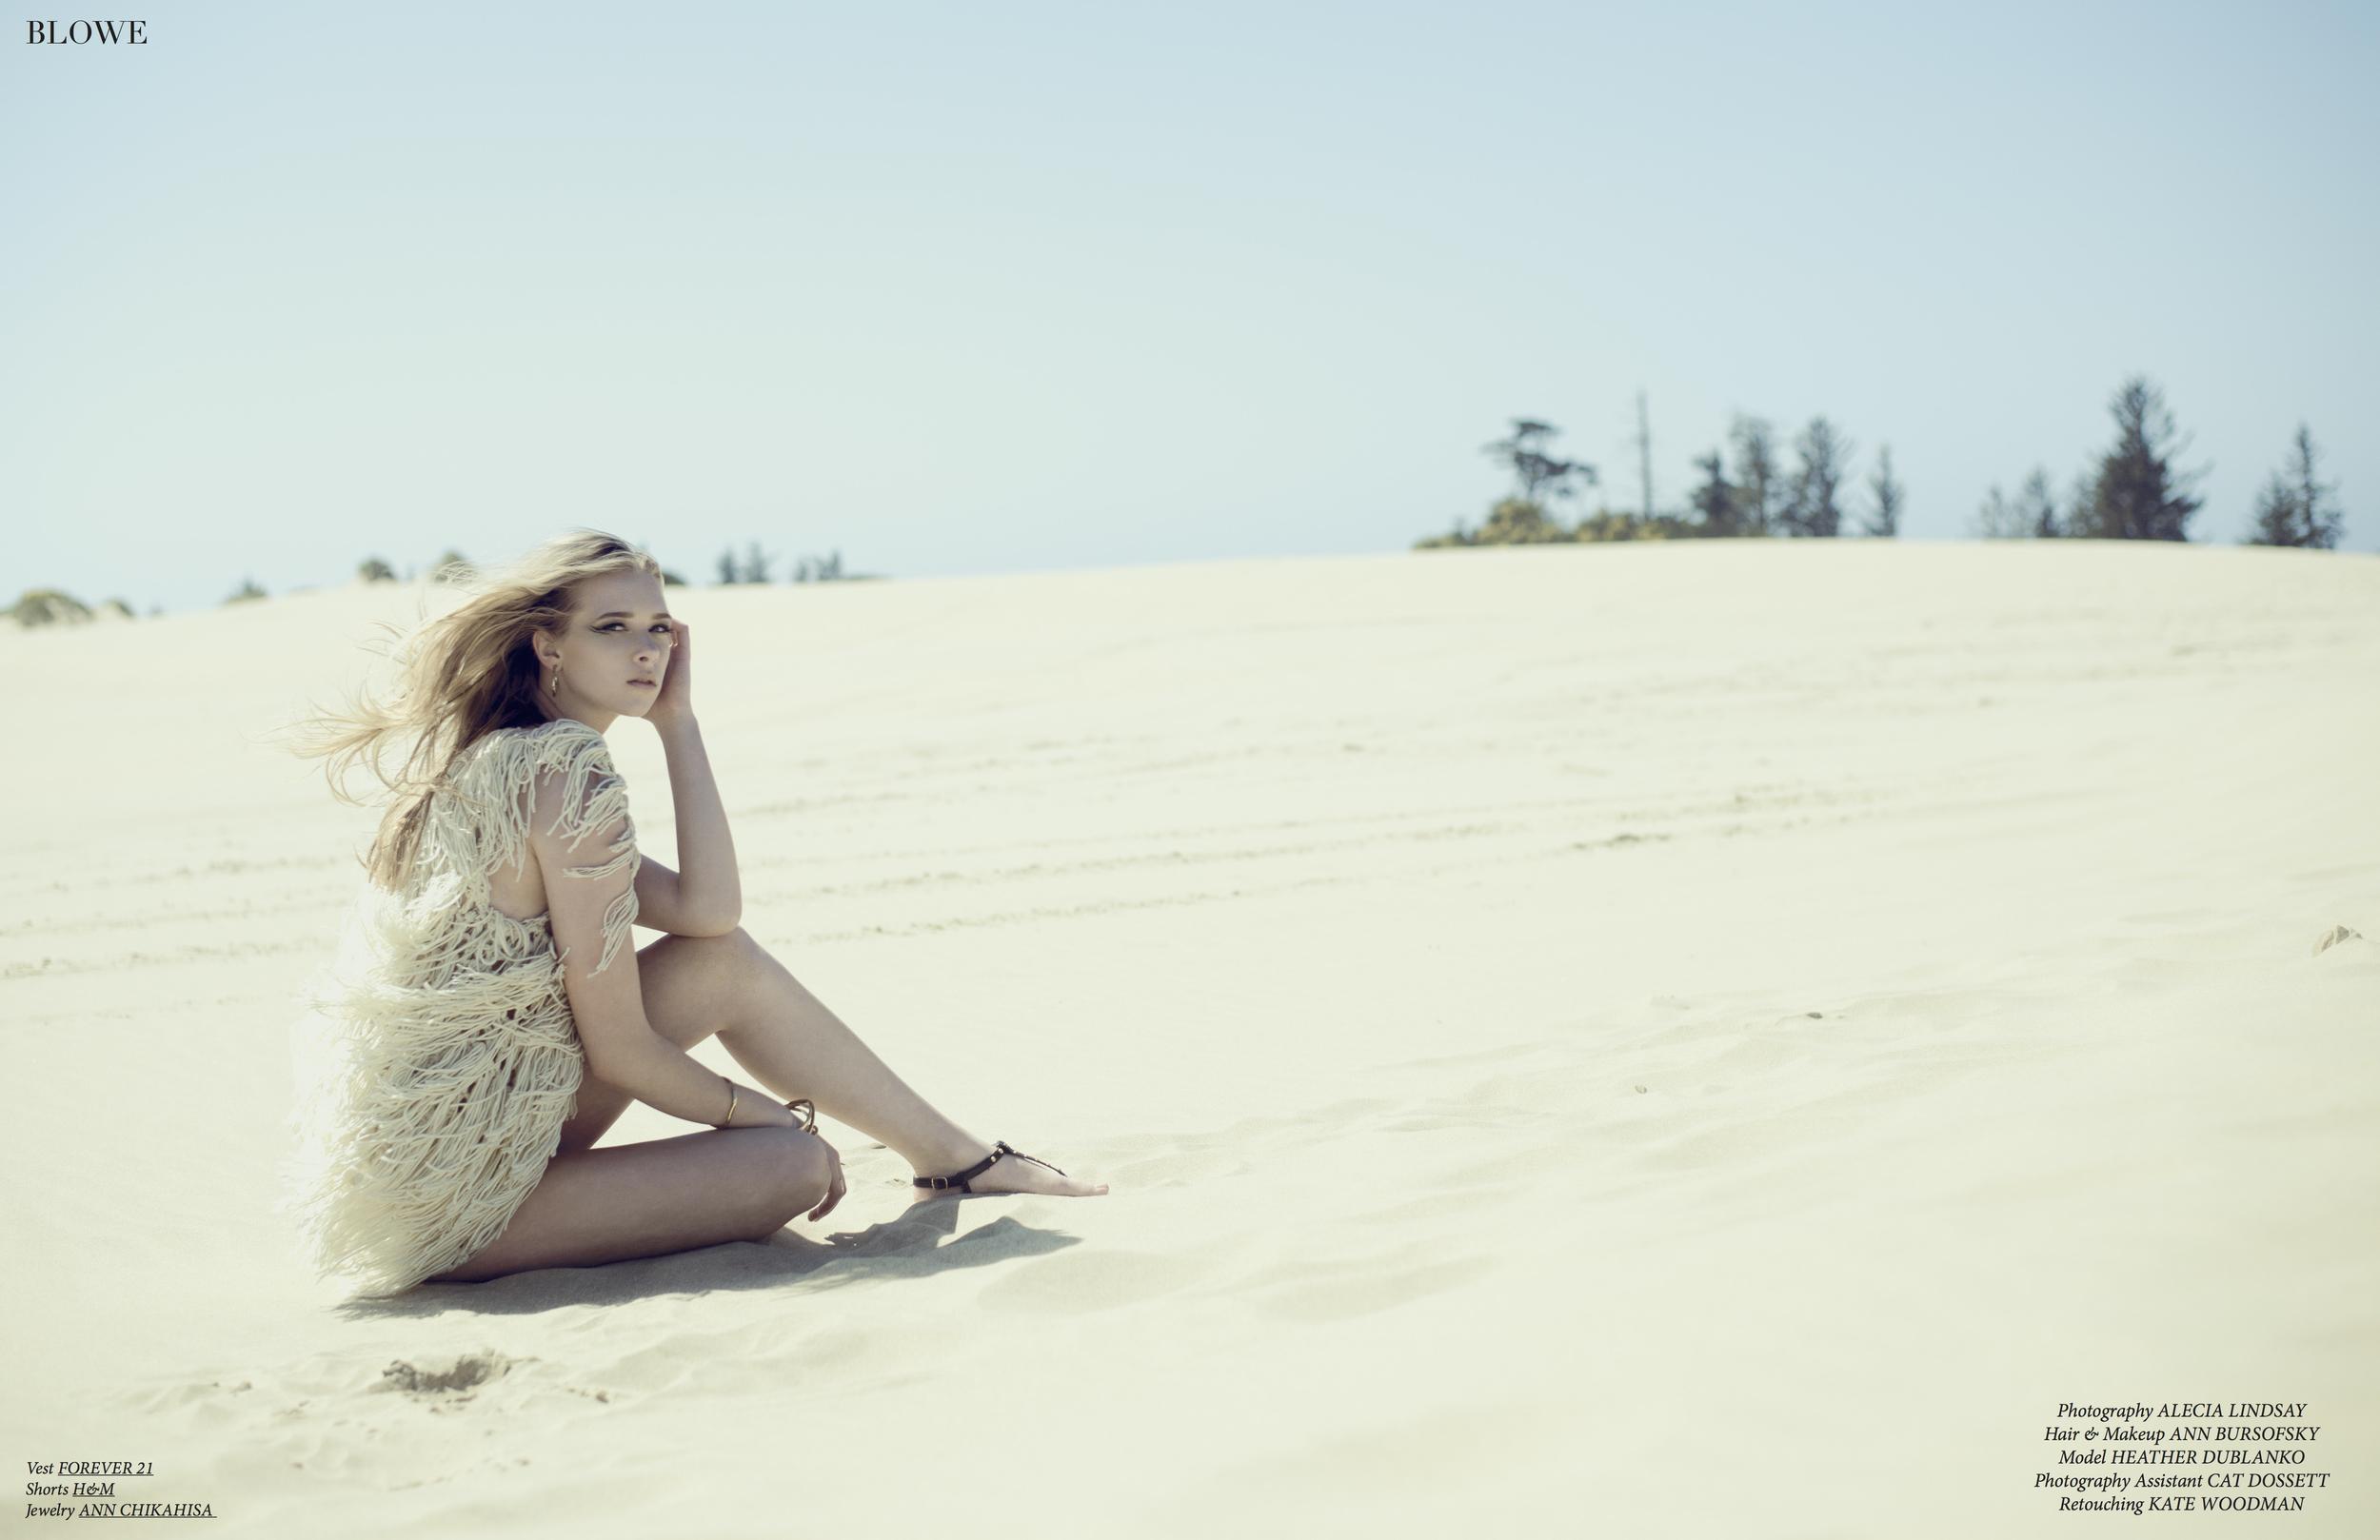 Los Angeles Brand Photographer Alecia Lindsay